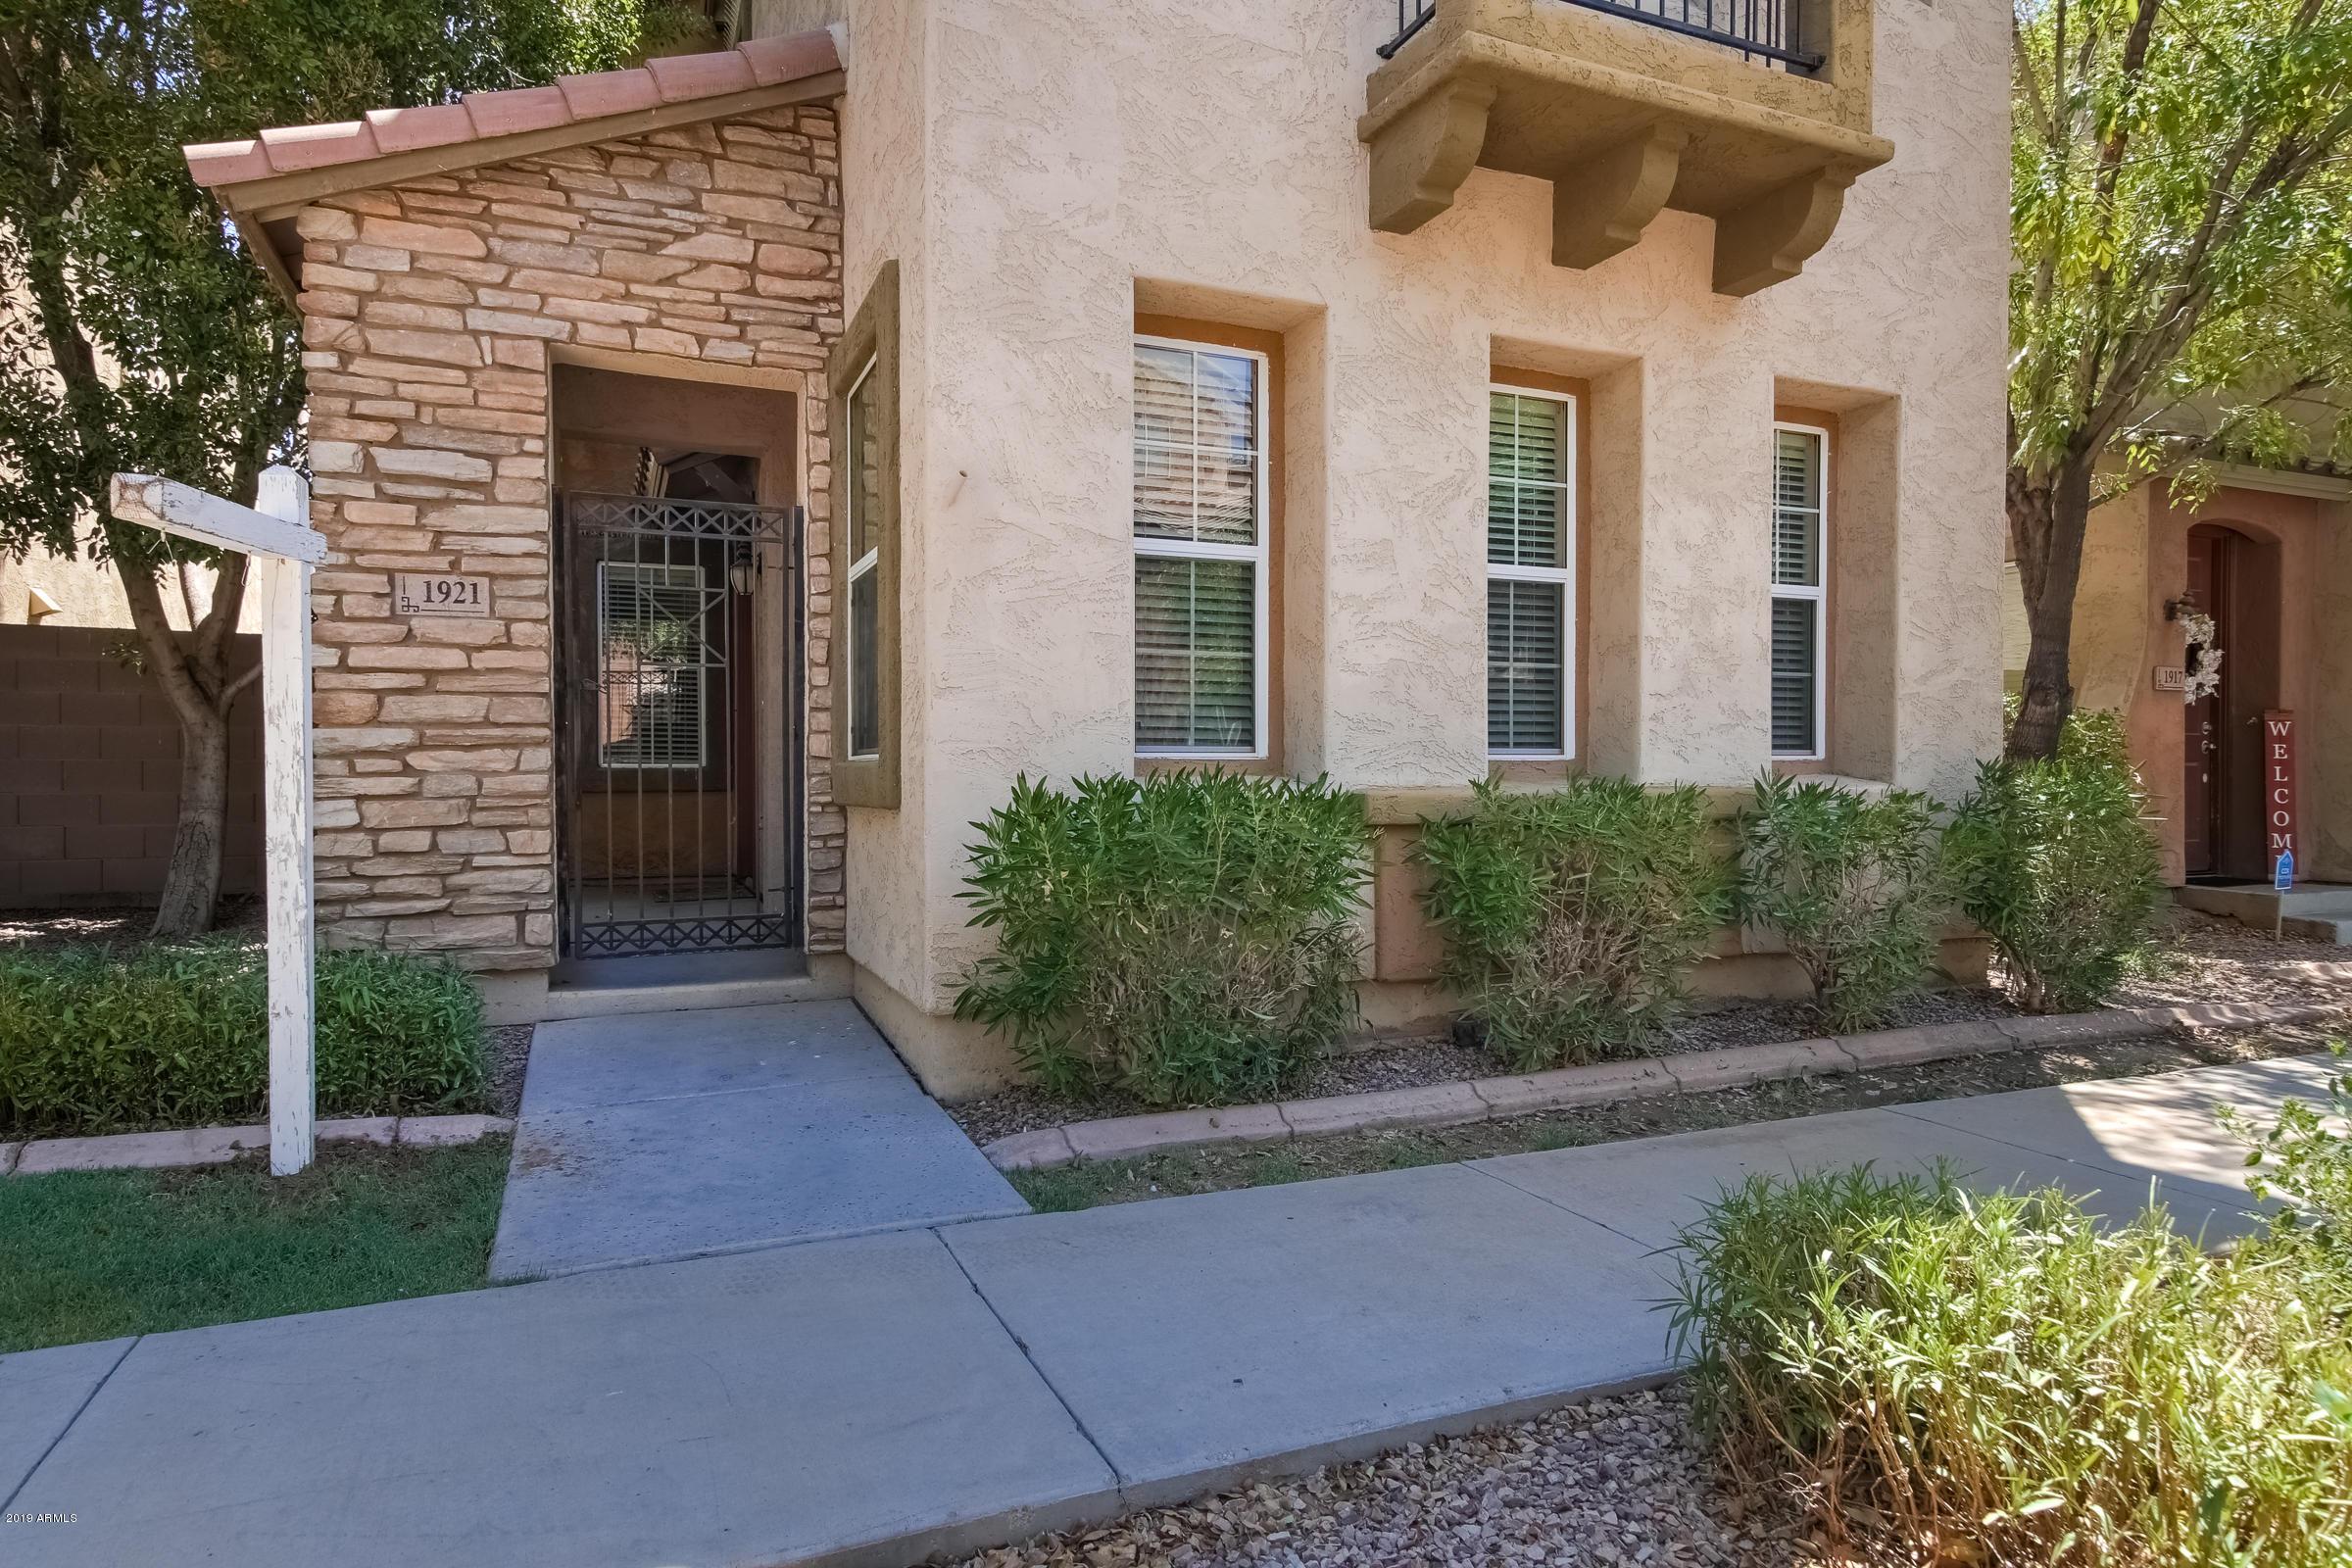 Photo for 1921 N 78th Avenue, Phoenix, AZ 85035 (MLS # 5964663)